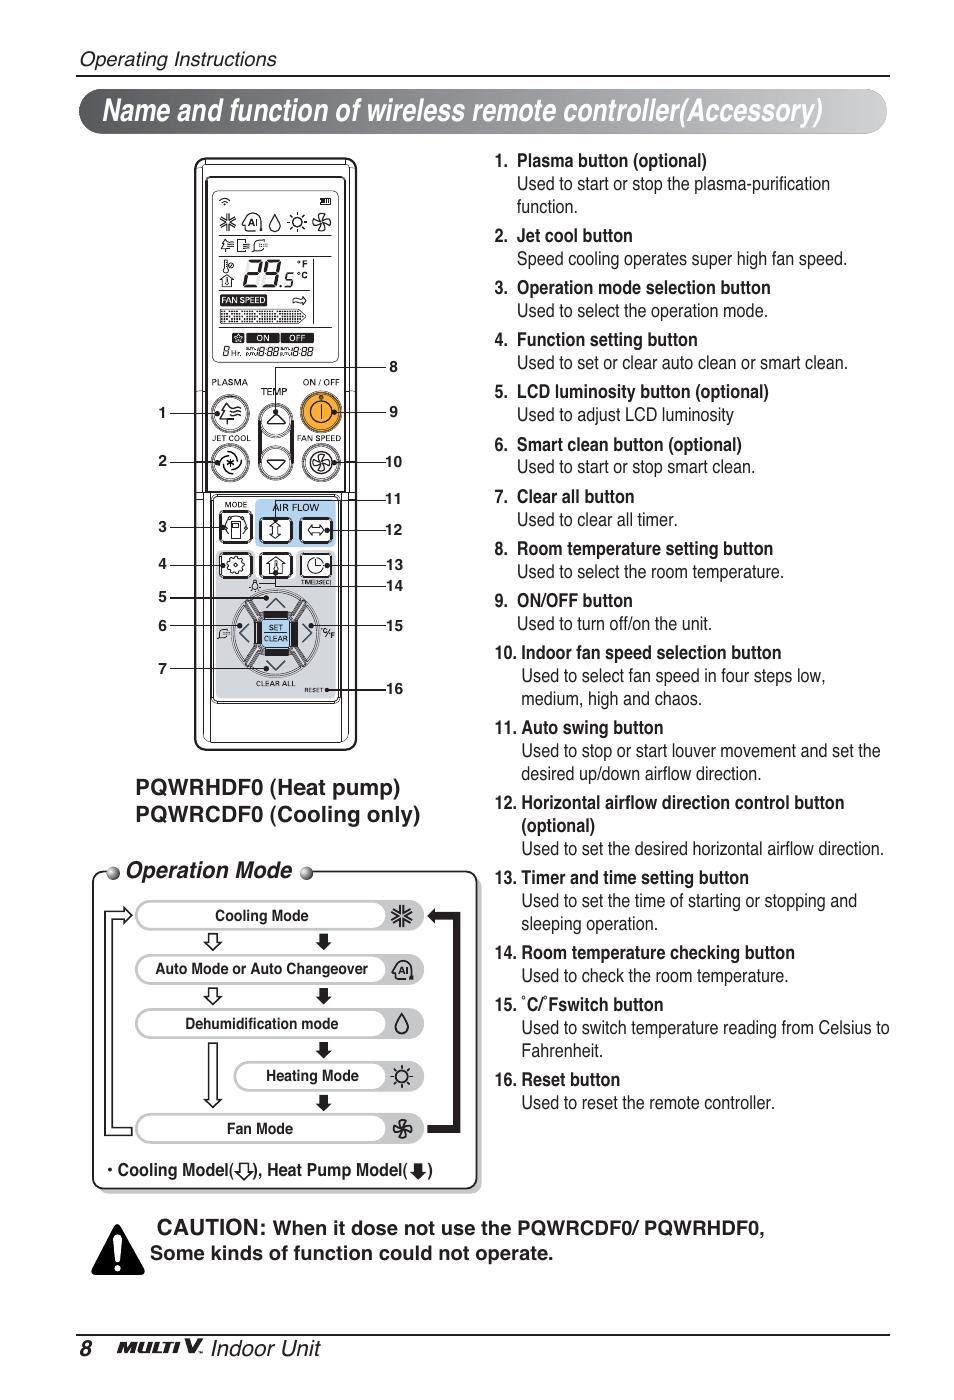 Airflow mode selection button